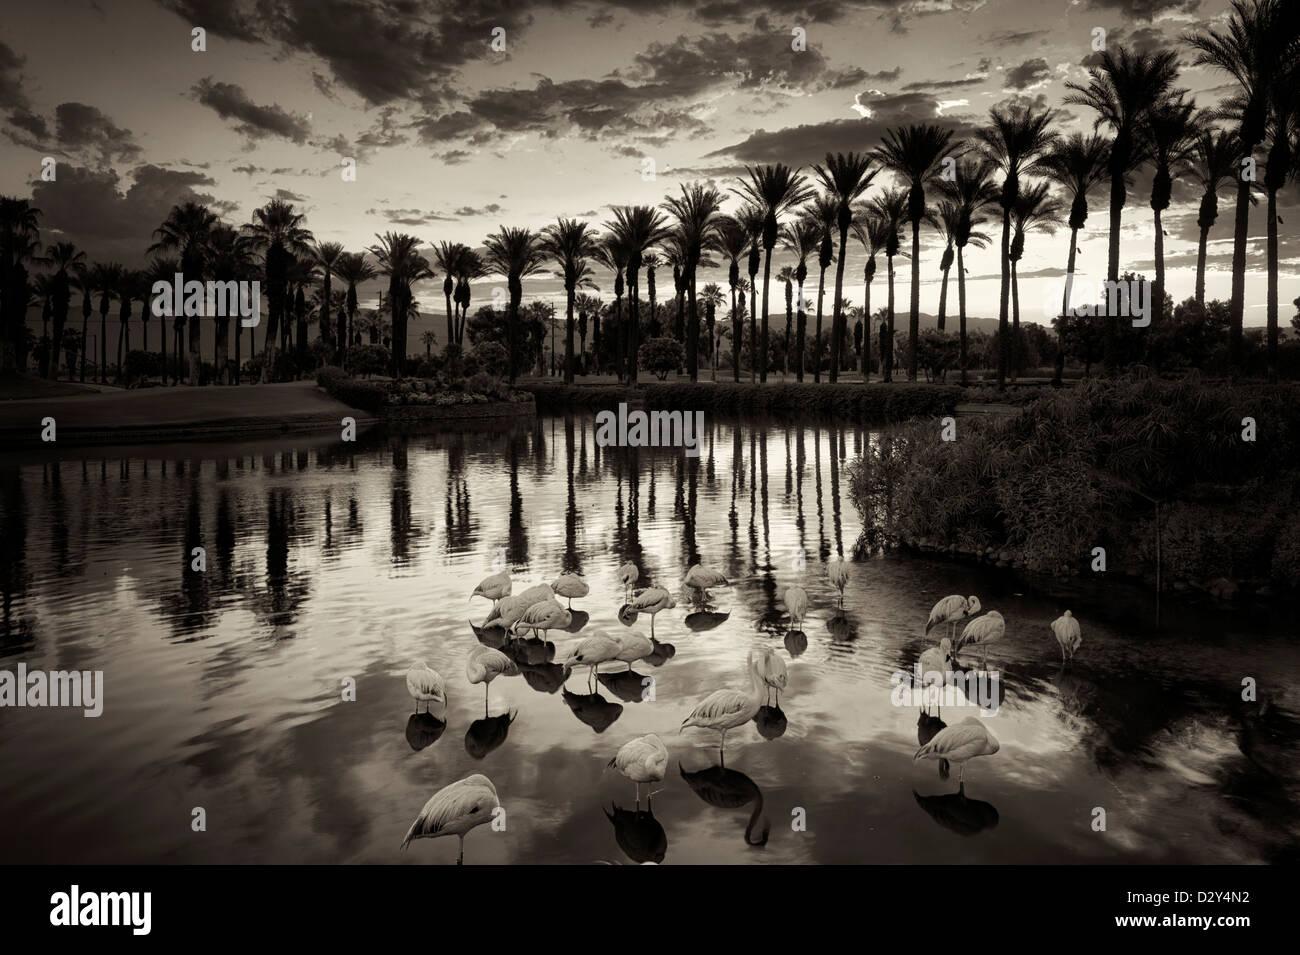 storm bird stockfotos storm bird bilder seite 2 alamy. Black Bedroom Furniture Sets. Home Design Ideas